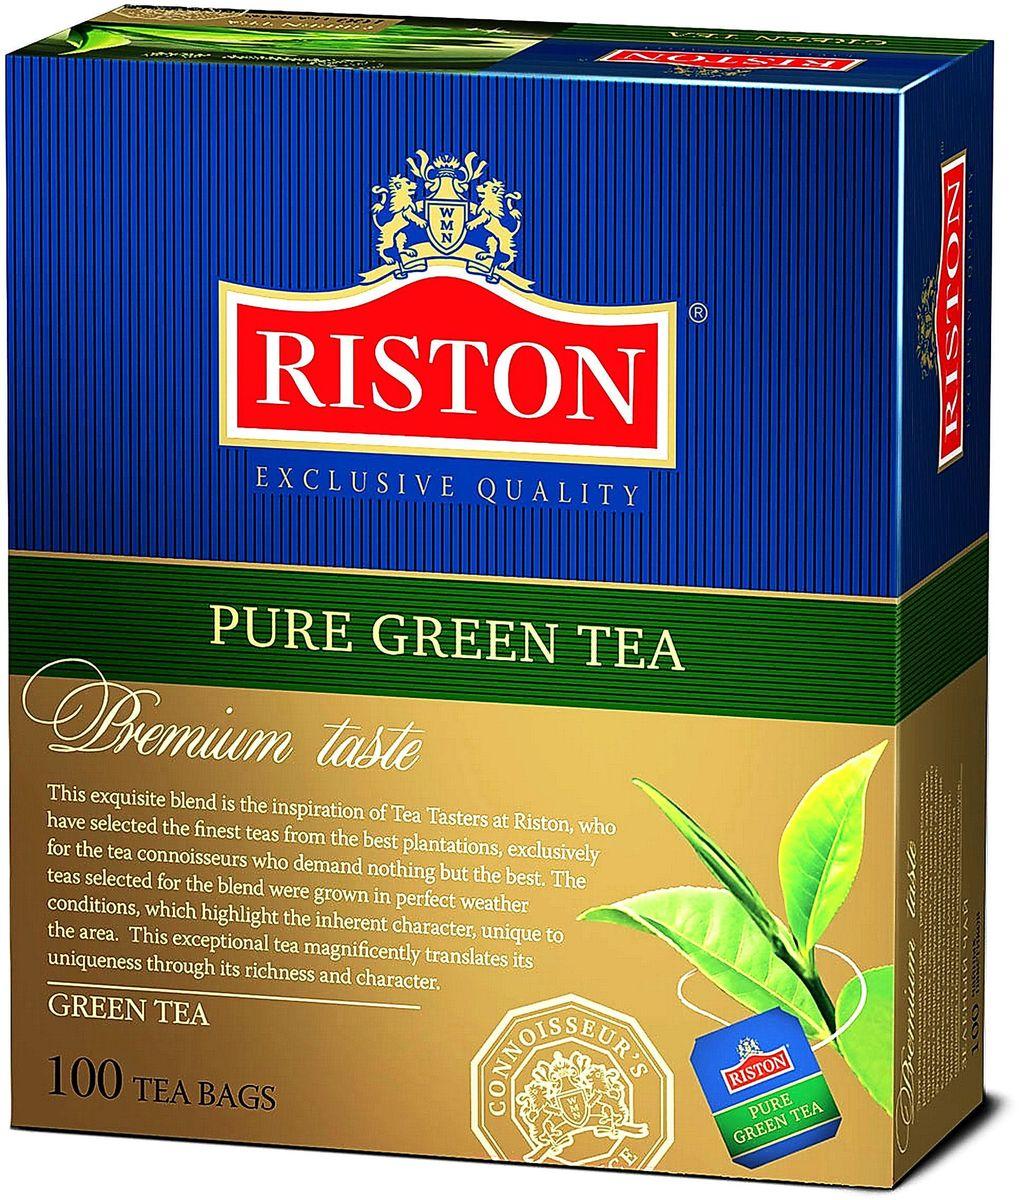 Riston Green зеленый чай в пакетиках, 100 шт riston файнест цейлон черный чай в пакетиках 100 шт